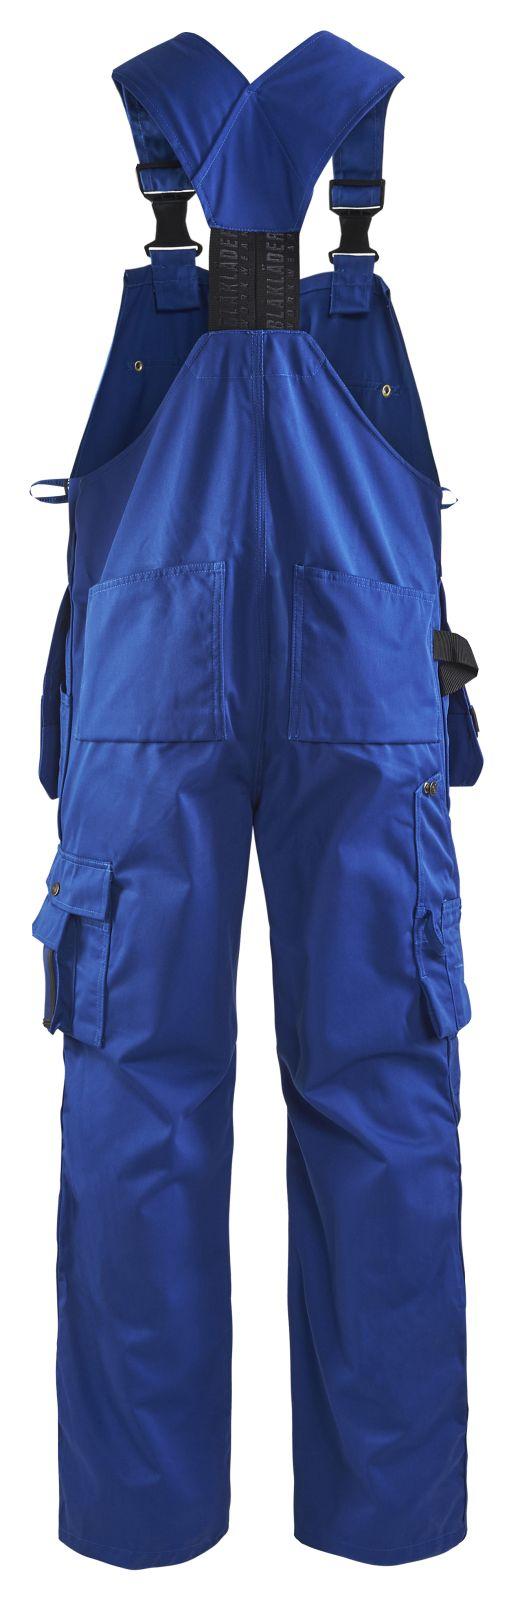 Blaklader Amerikaanse overalls 26001860 korenblauw(8500)